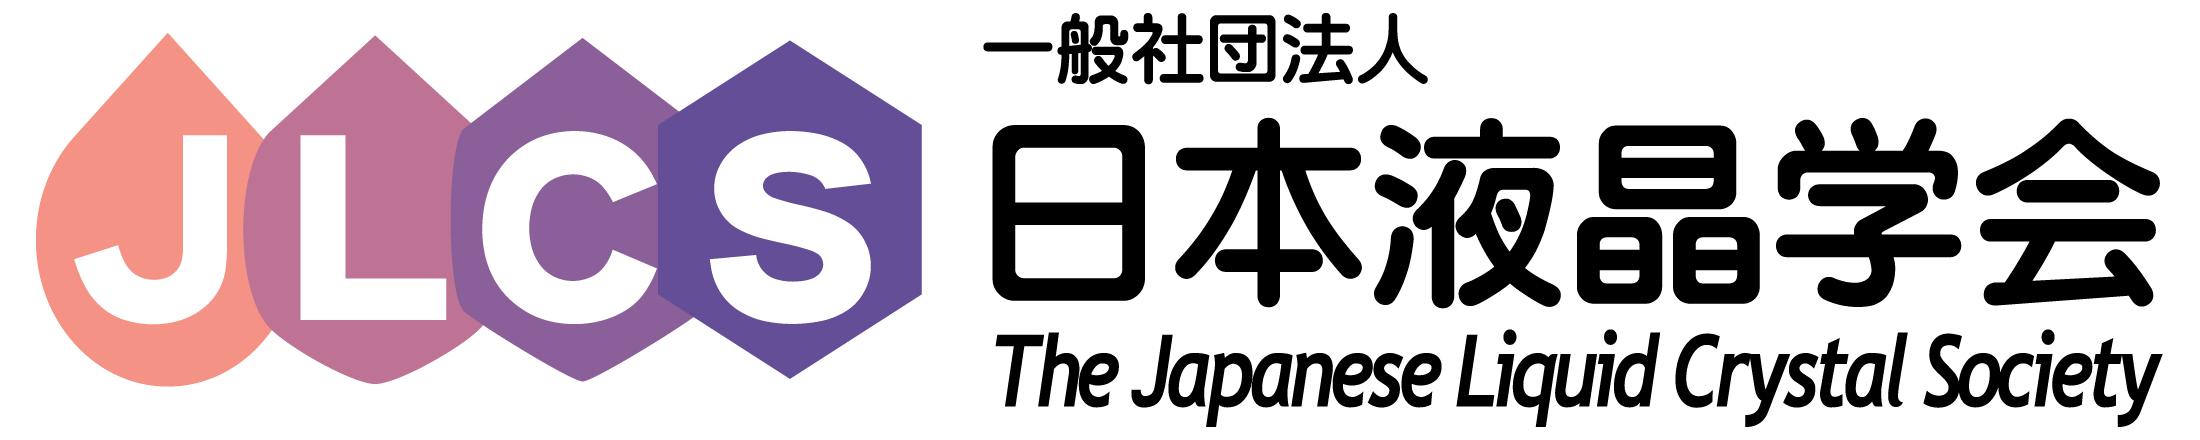 JLCS Logo with 一般社団法人日本液晶学会